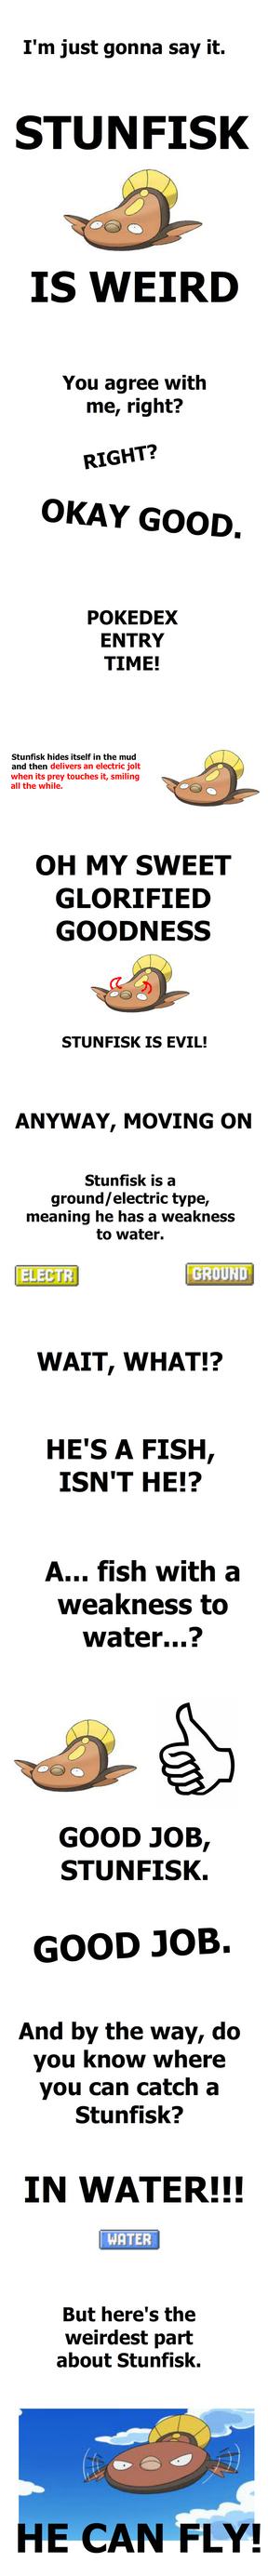 When Stunfisk Fly by Tayzonrai